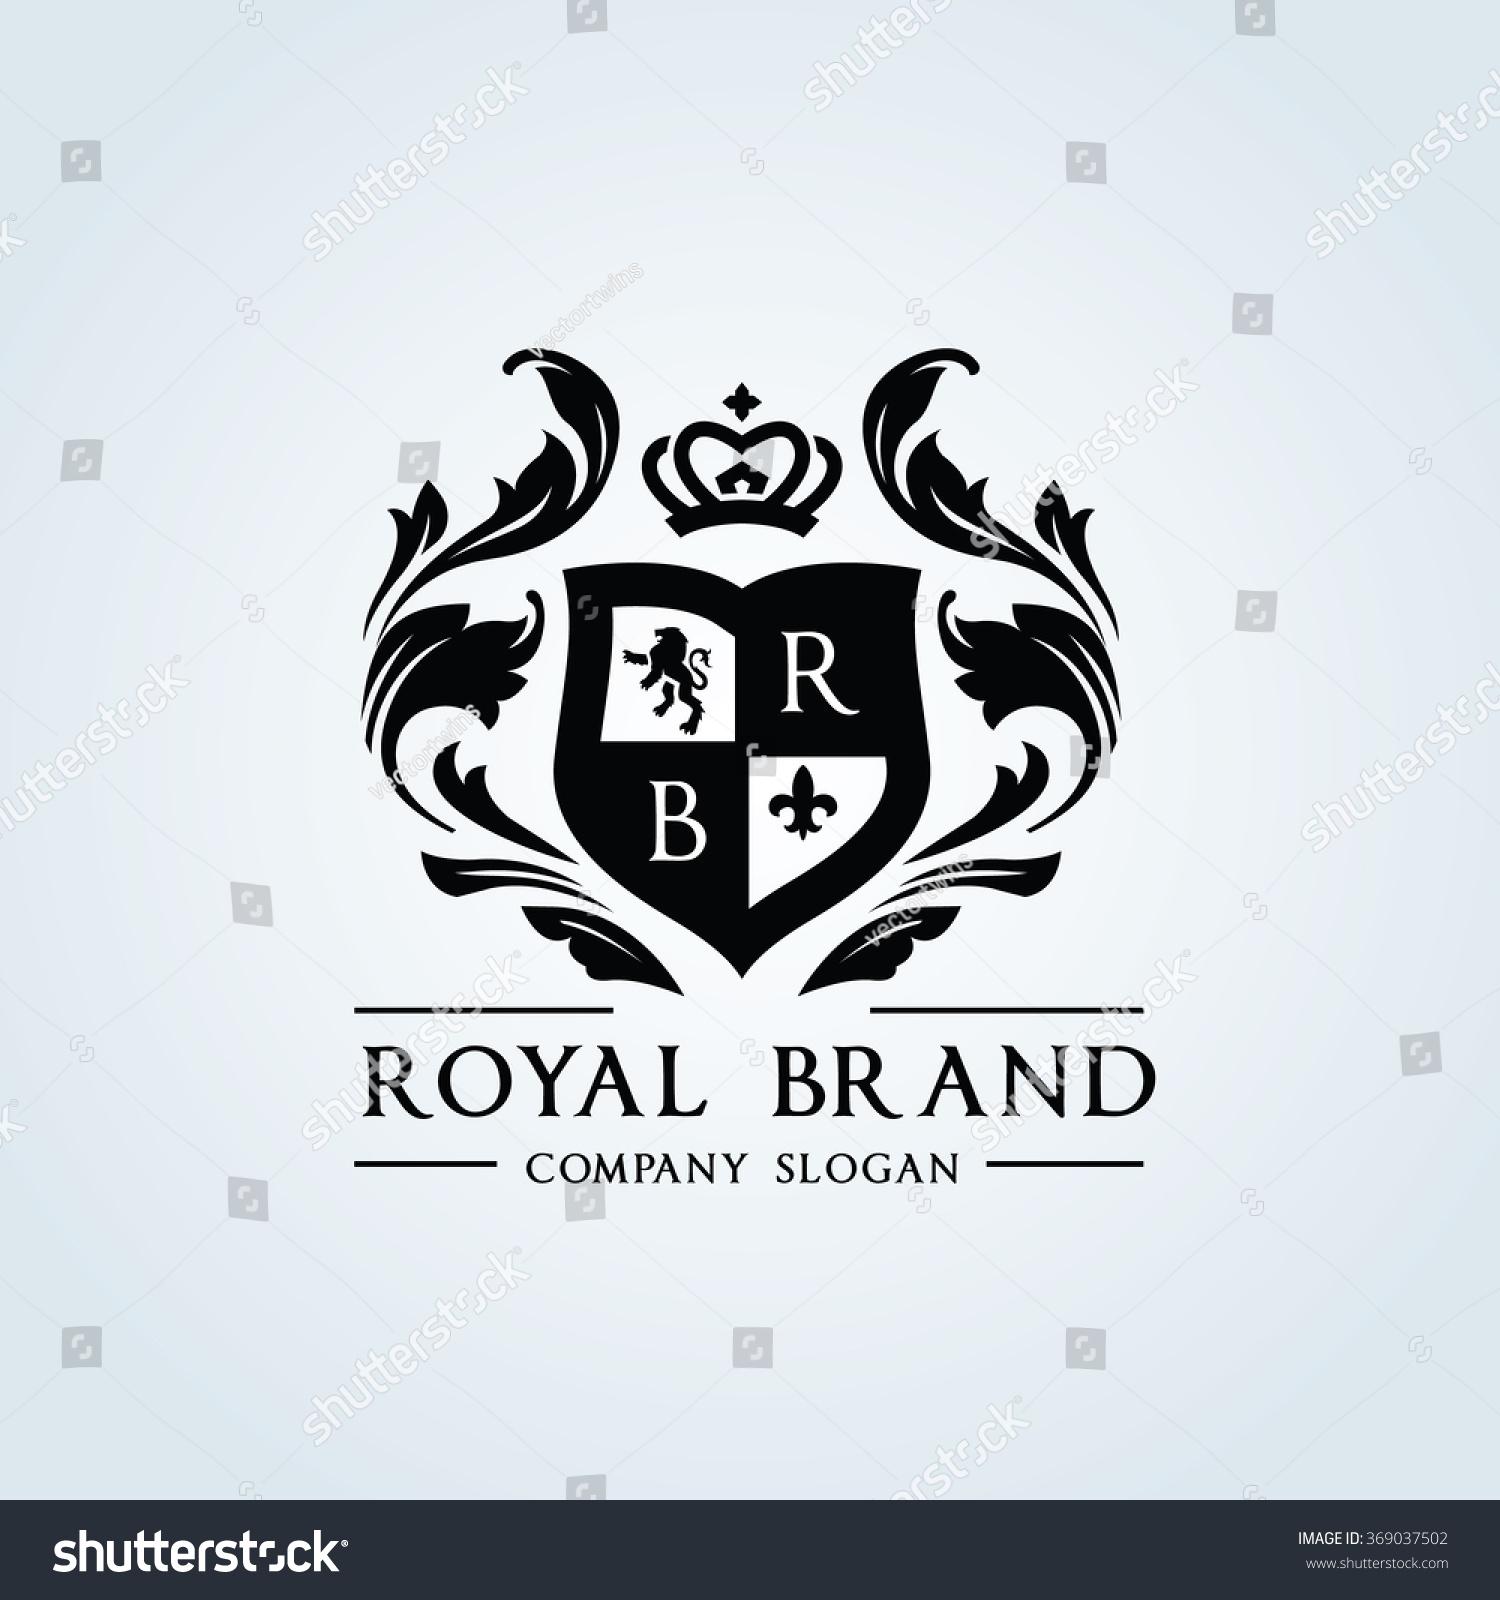 royal brand logocrown logolion logocrest logovector stock vector 369037502 shutterstock. Black Bedroom Furniture Sets. Home Design Ideas